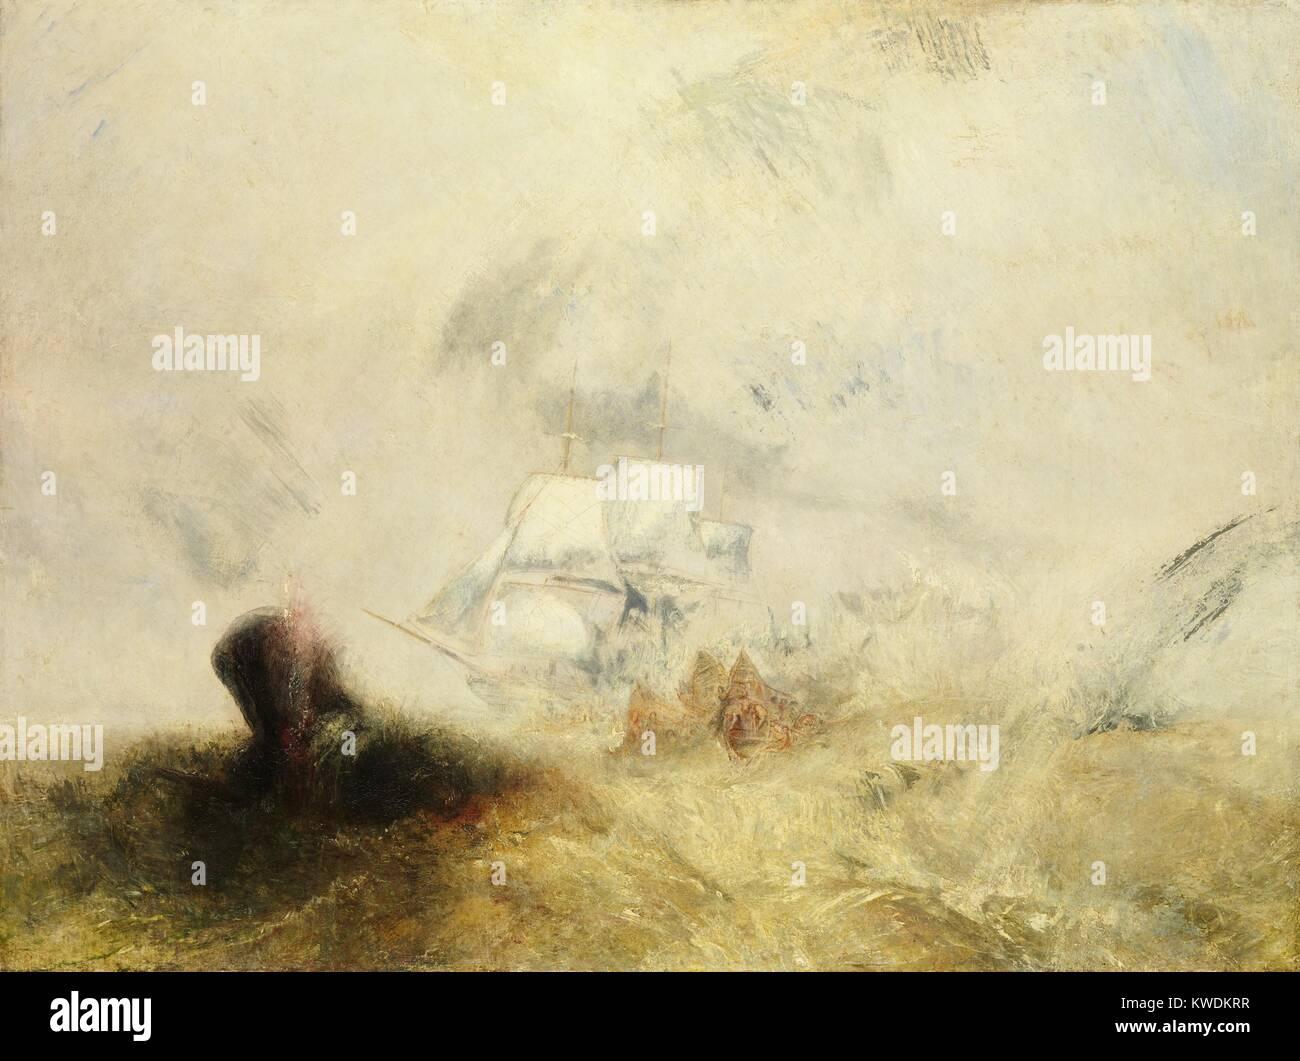 Walfänger, von Joseph Mallord William Turner, 1845, British Malerei, Öl auf Leinwand. Turner umhüllt Stockbild